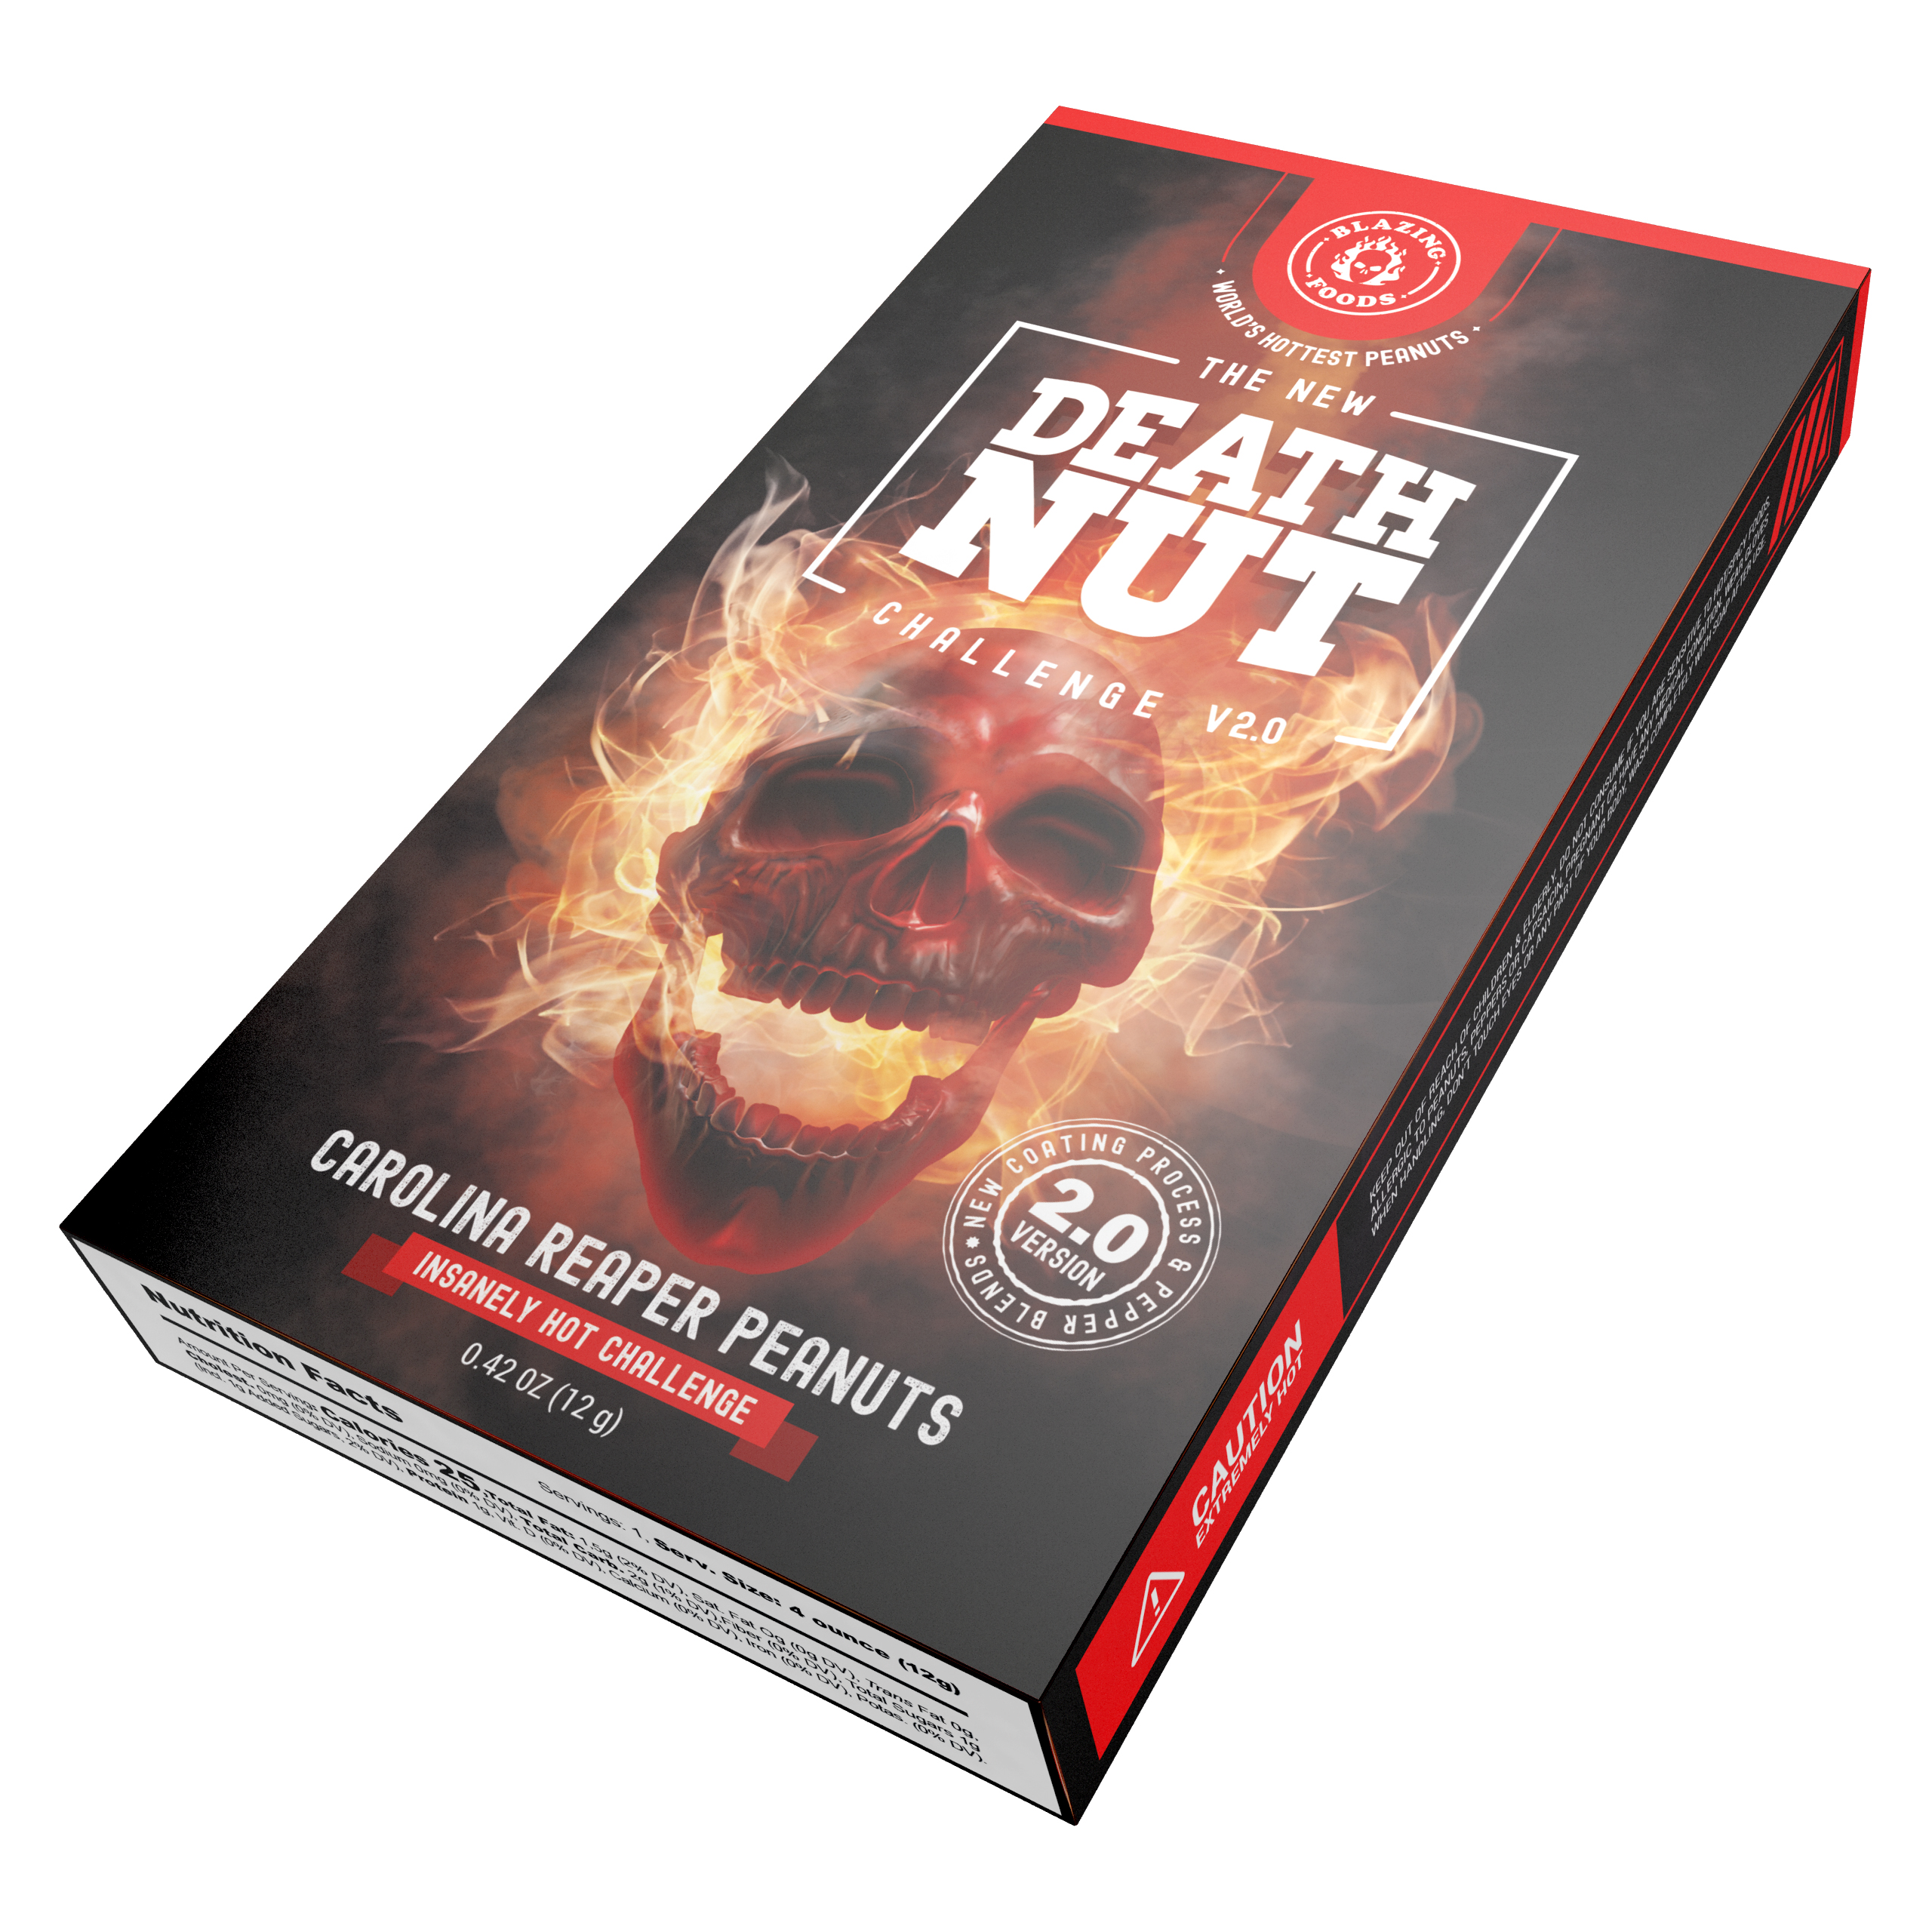 Death Nut Challenge 2: Hottest Blazing Peanuts On Earth